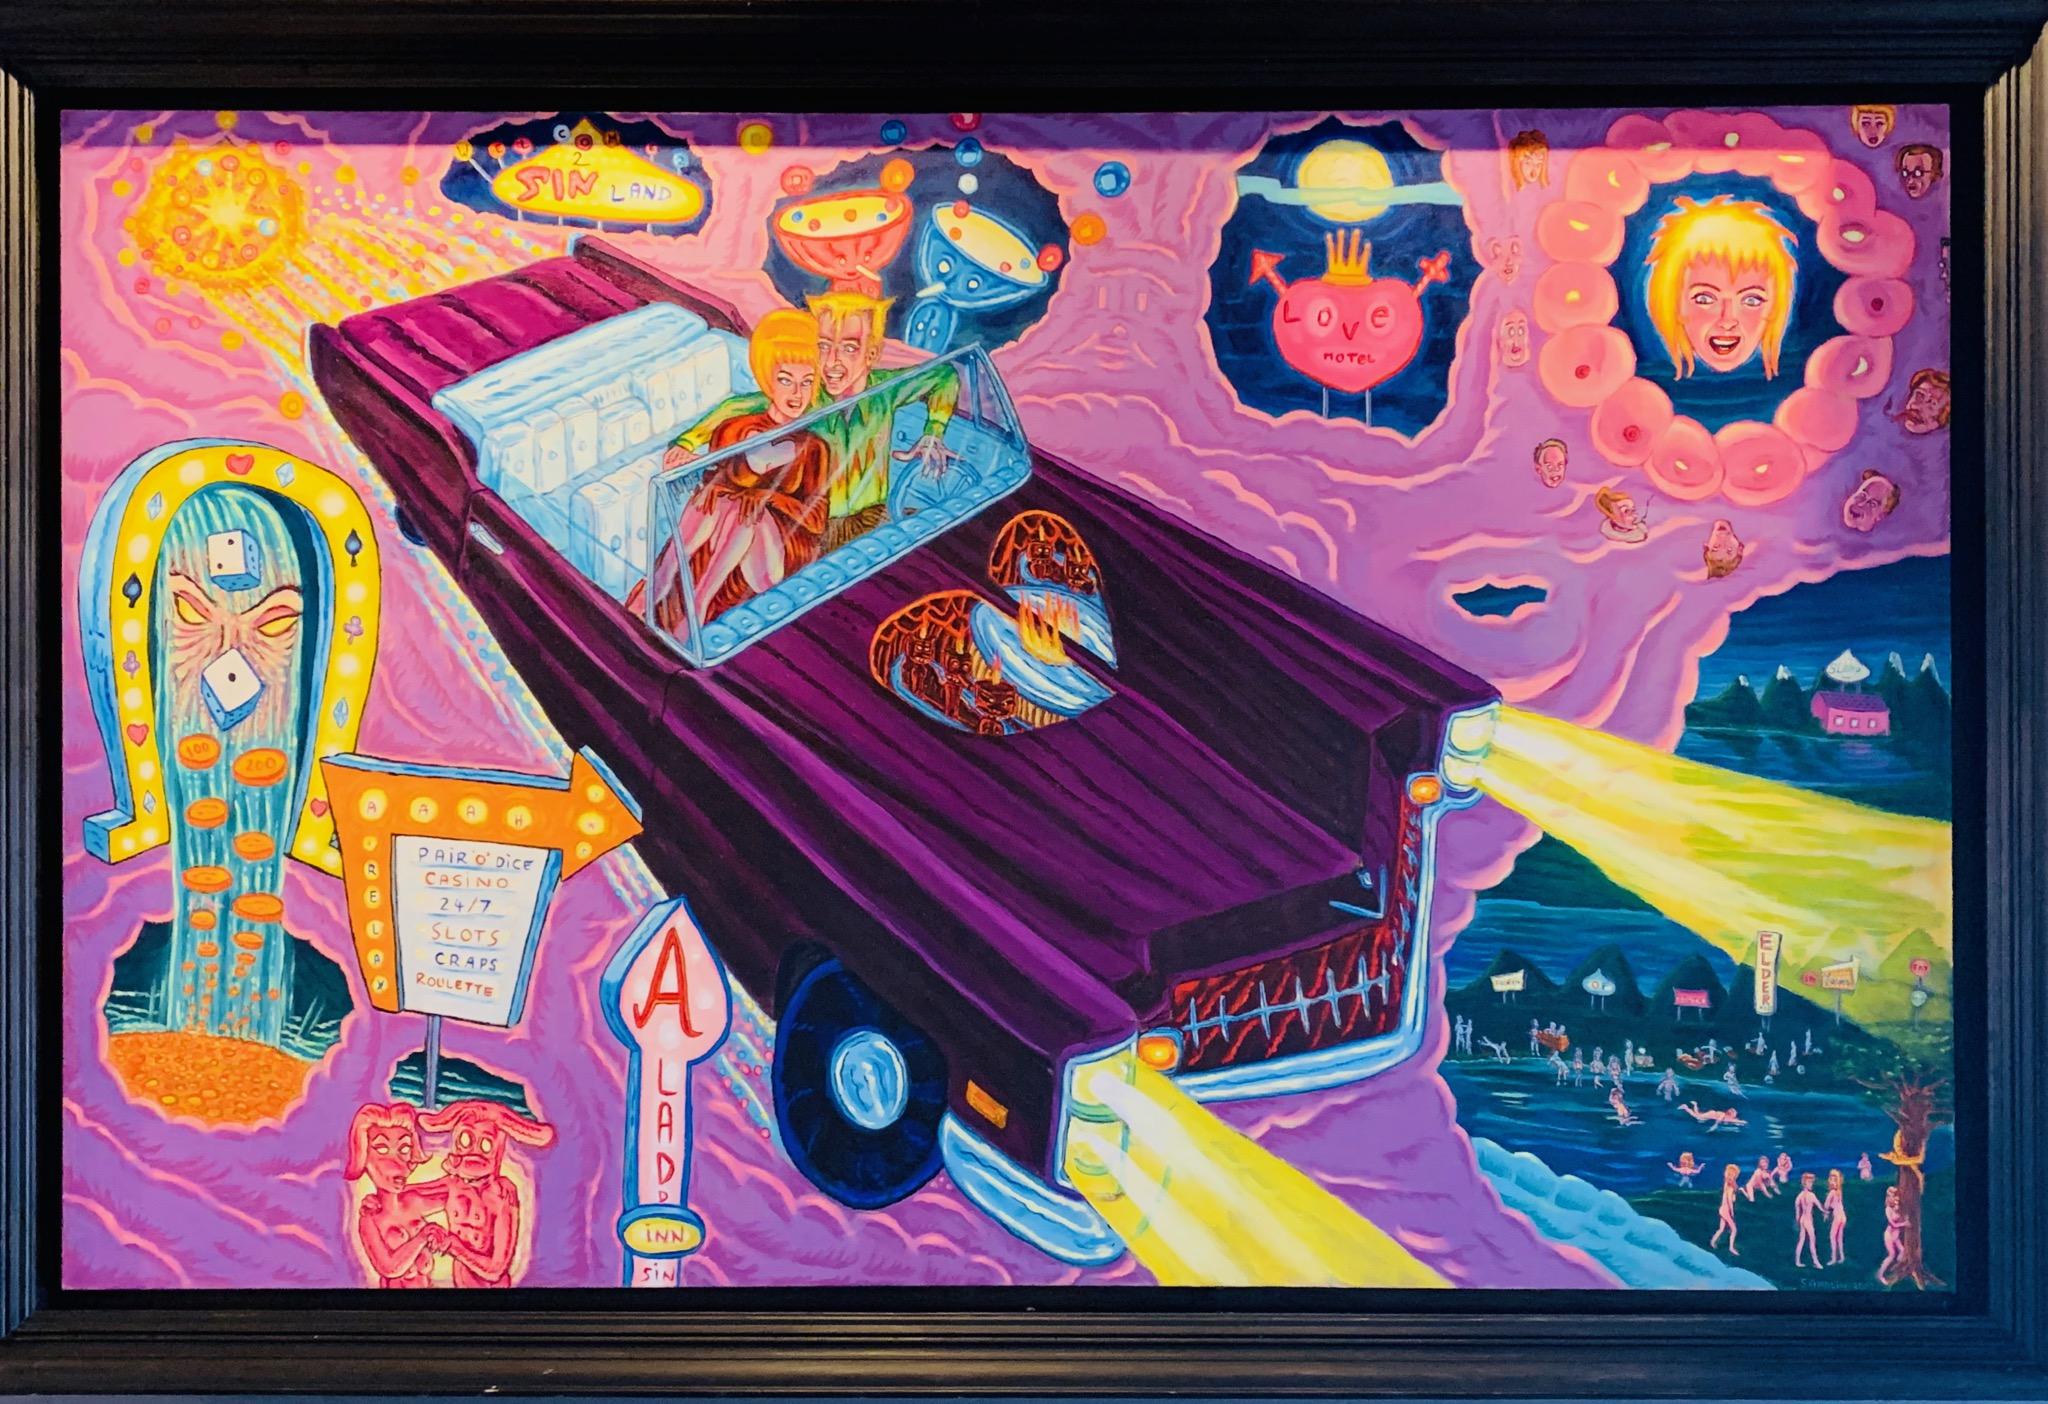 Pair o Dice artwork by David Sandlin - art listed for sale on Artplode